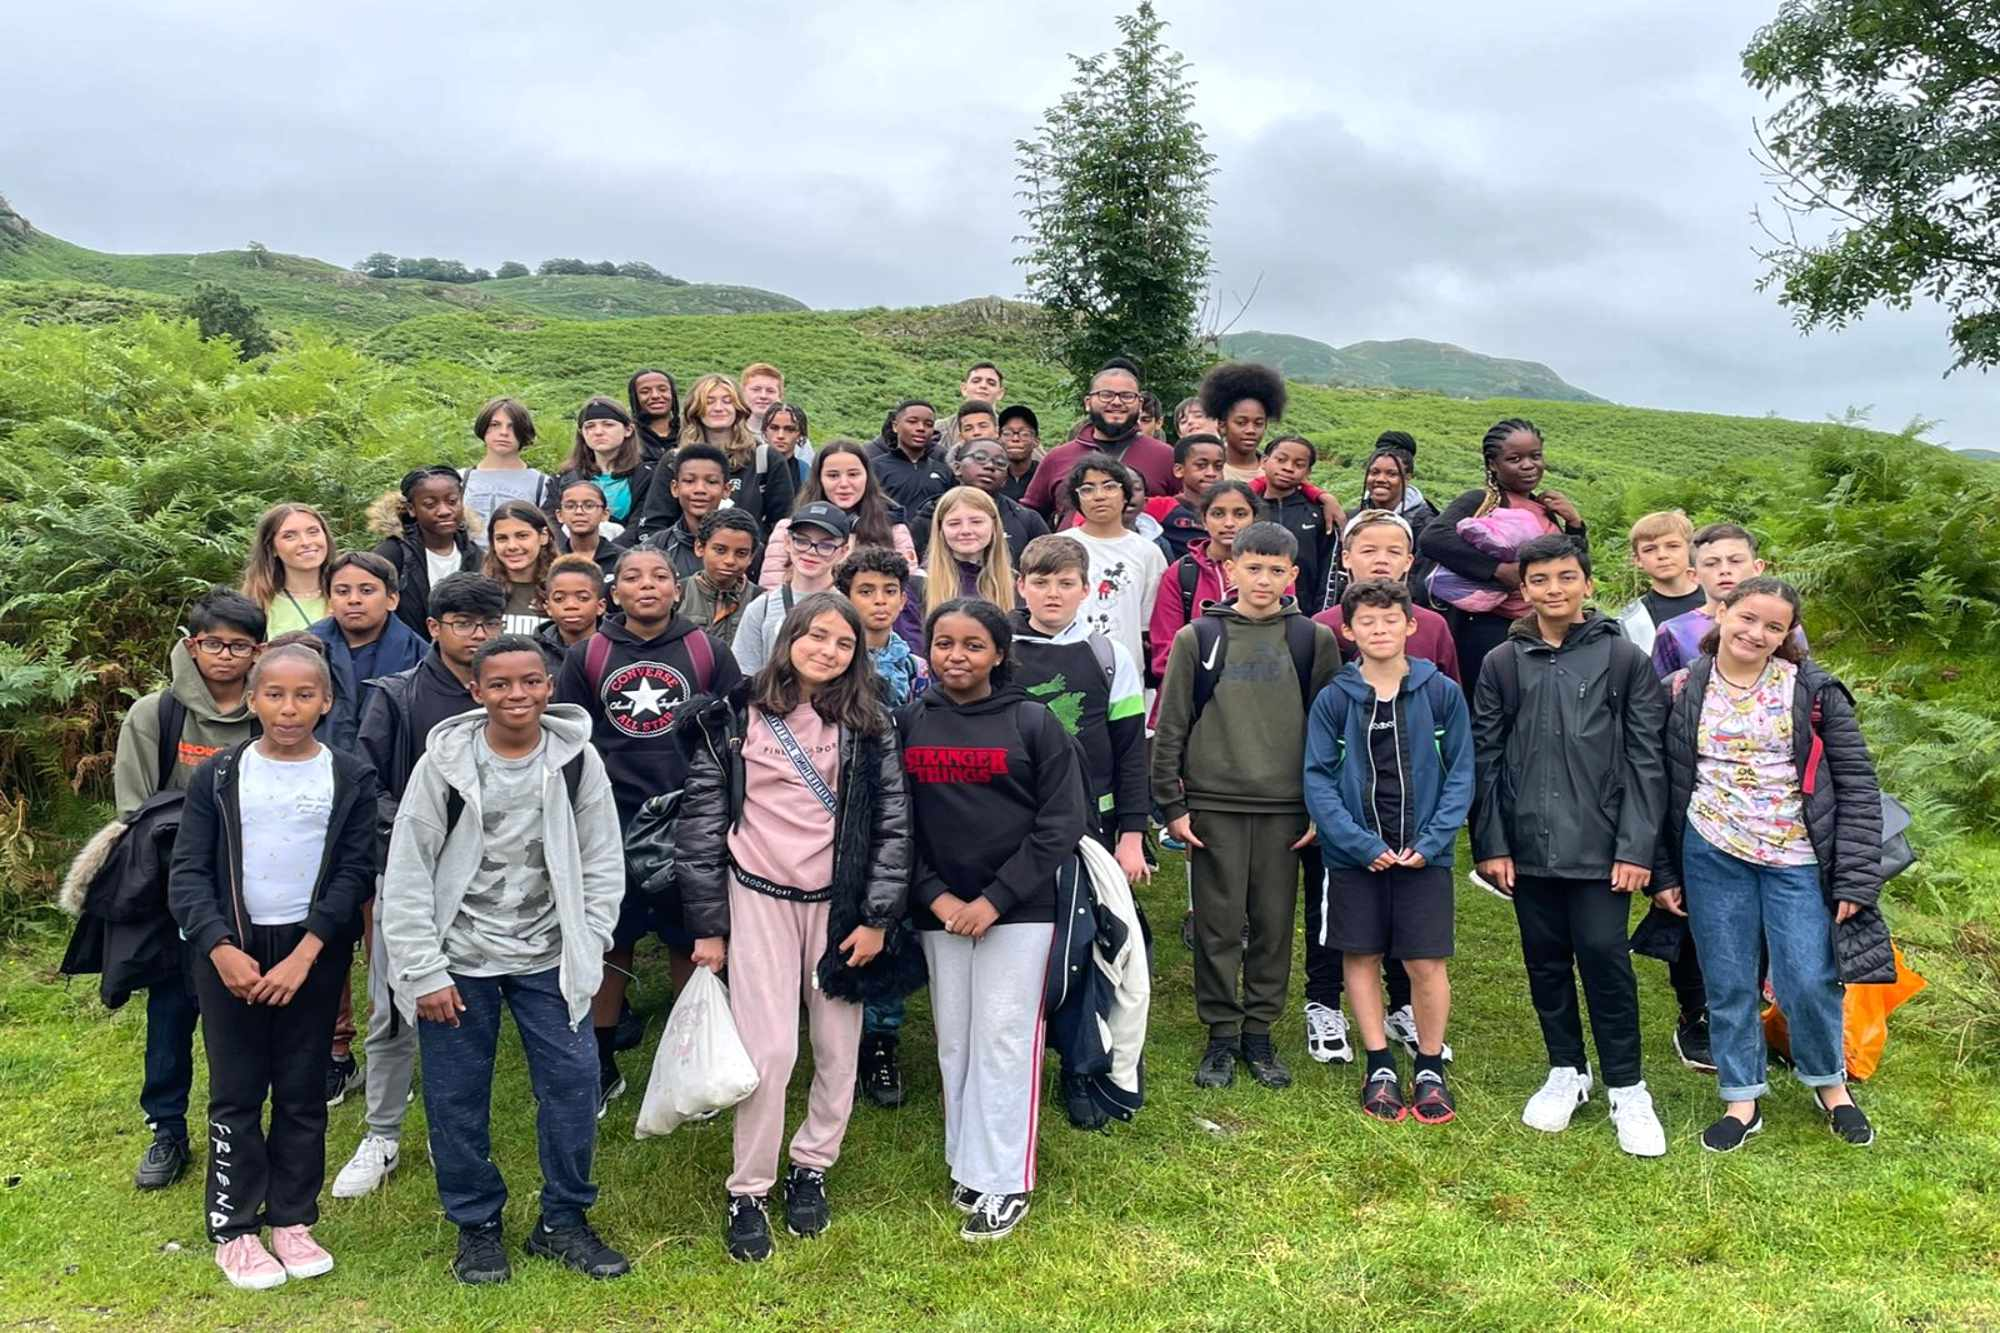 Group of school children on a school trip